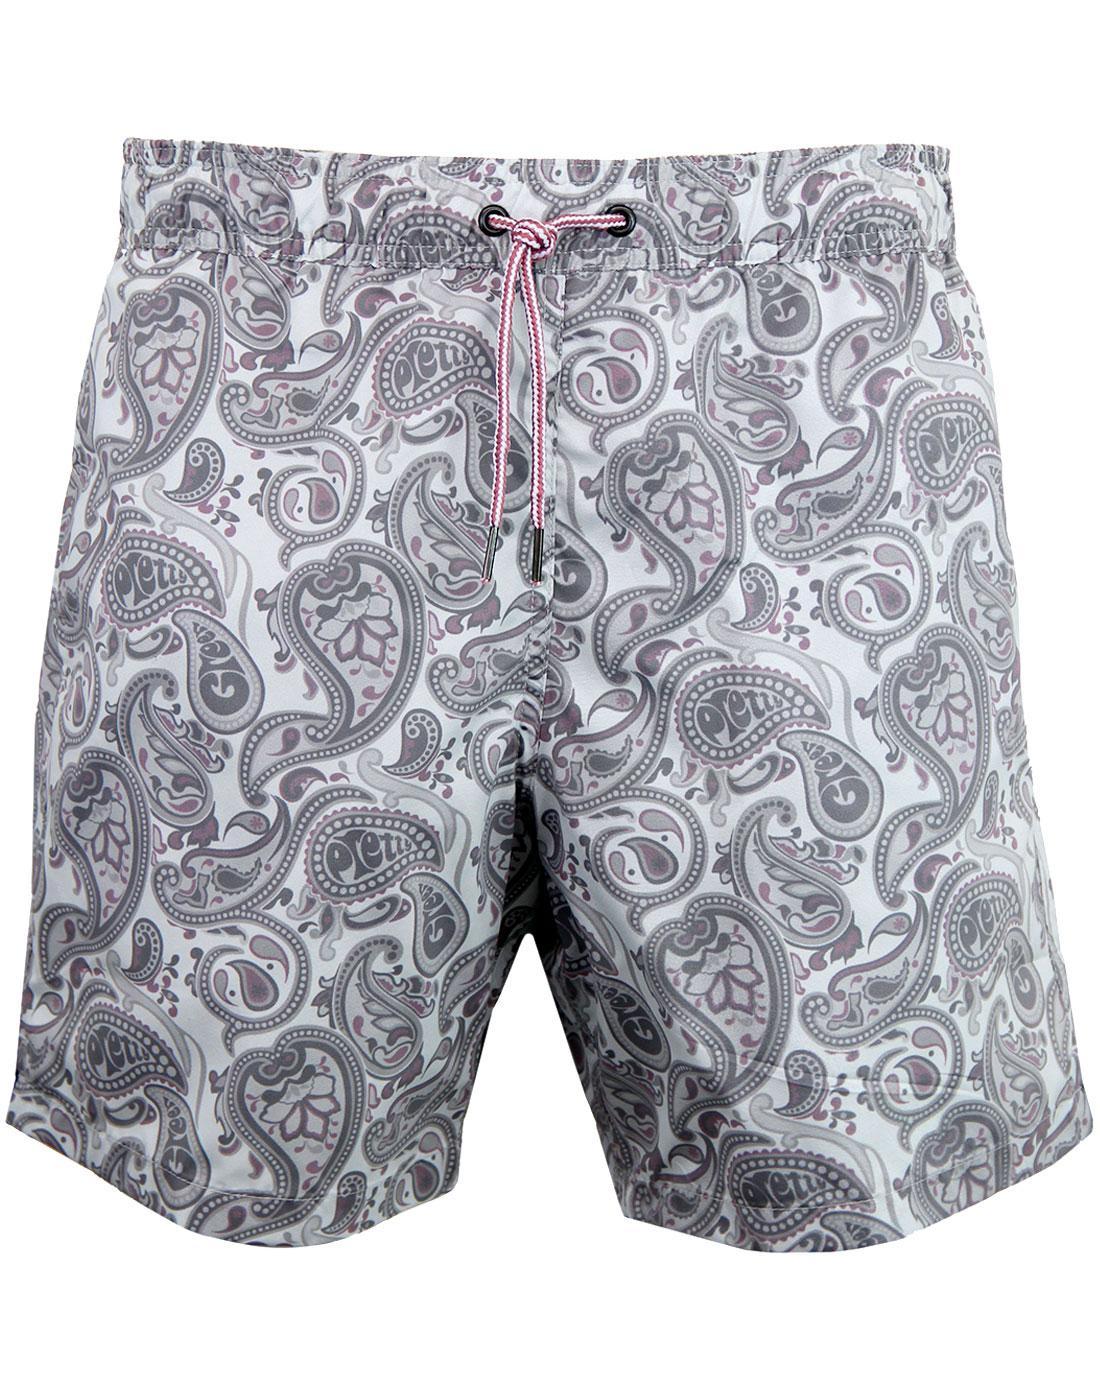 PRETTY GREEN Signature Paisley Swim Shorts - Grey